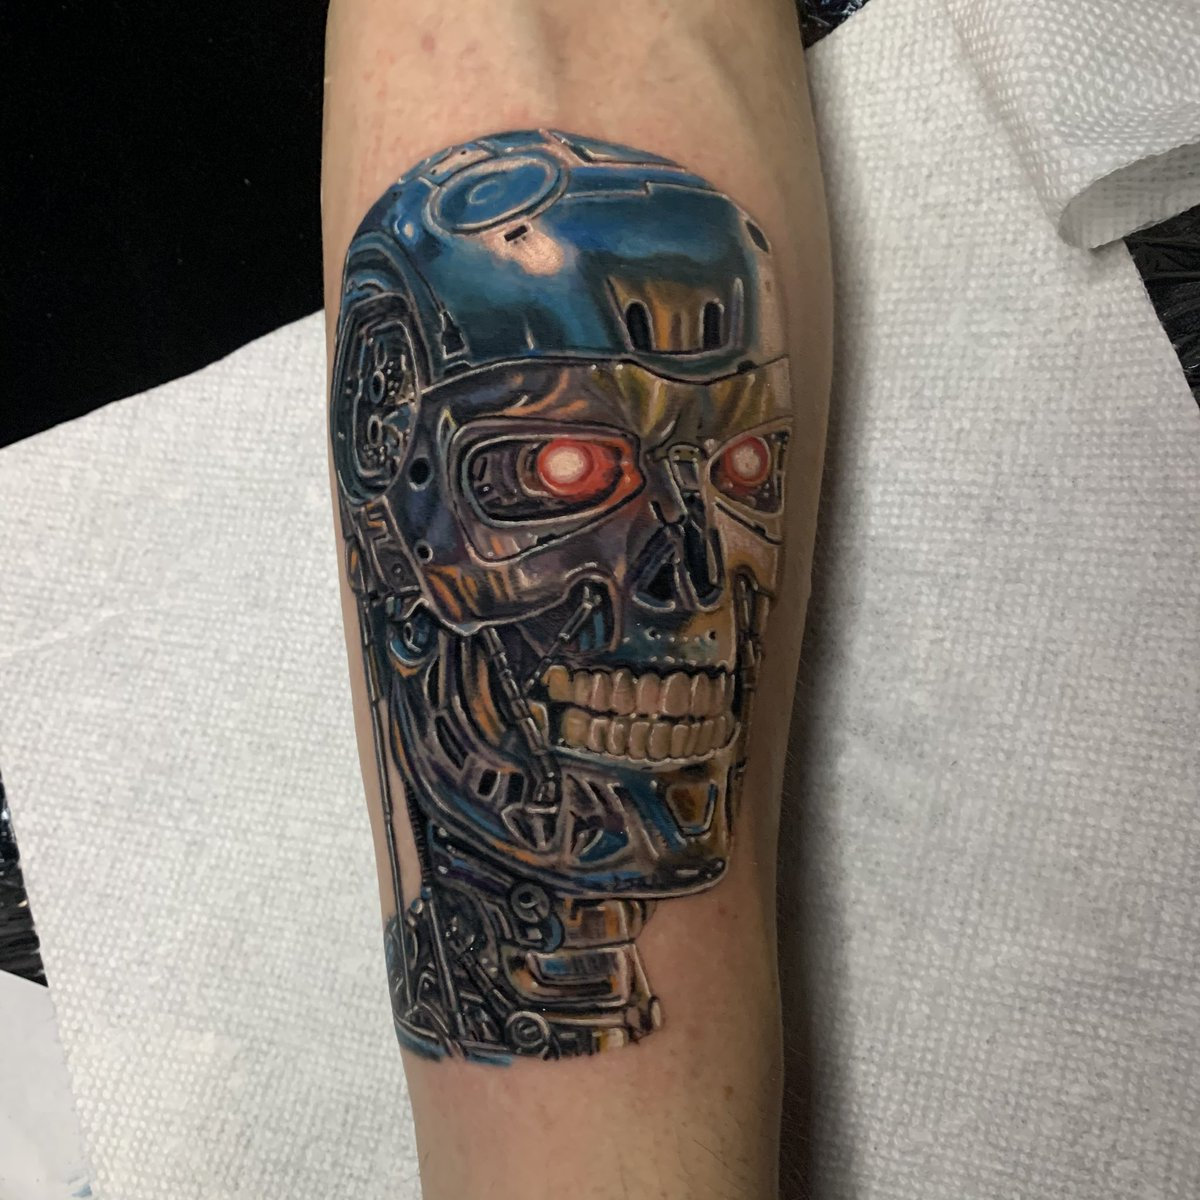 #Geek 🤓 Awesome of the Day: '#Terminator' Forearm Piece by #Tattoo Artist @natebeavers13 #SamaTattoo #SamaGeek